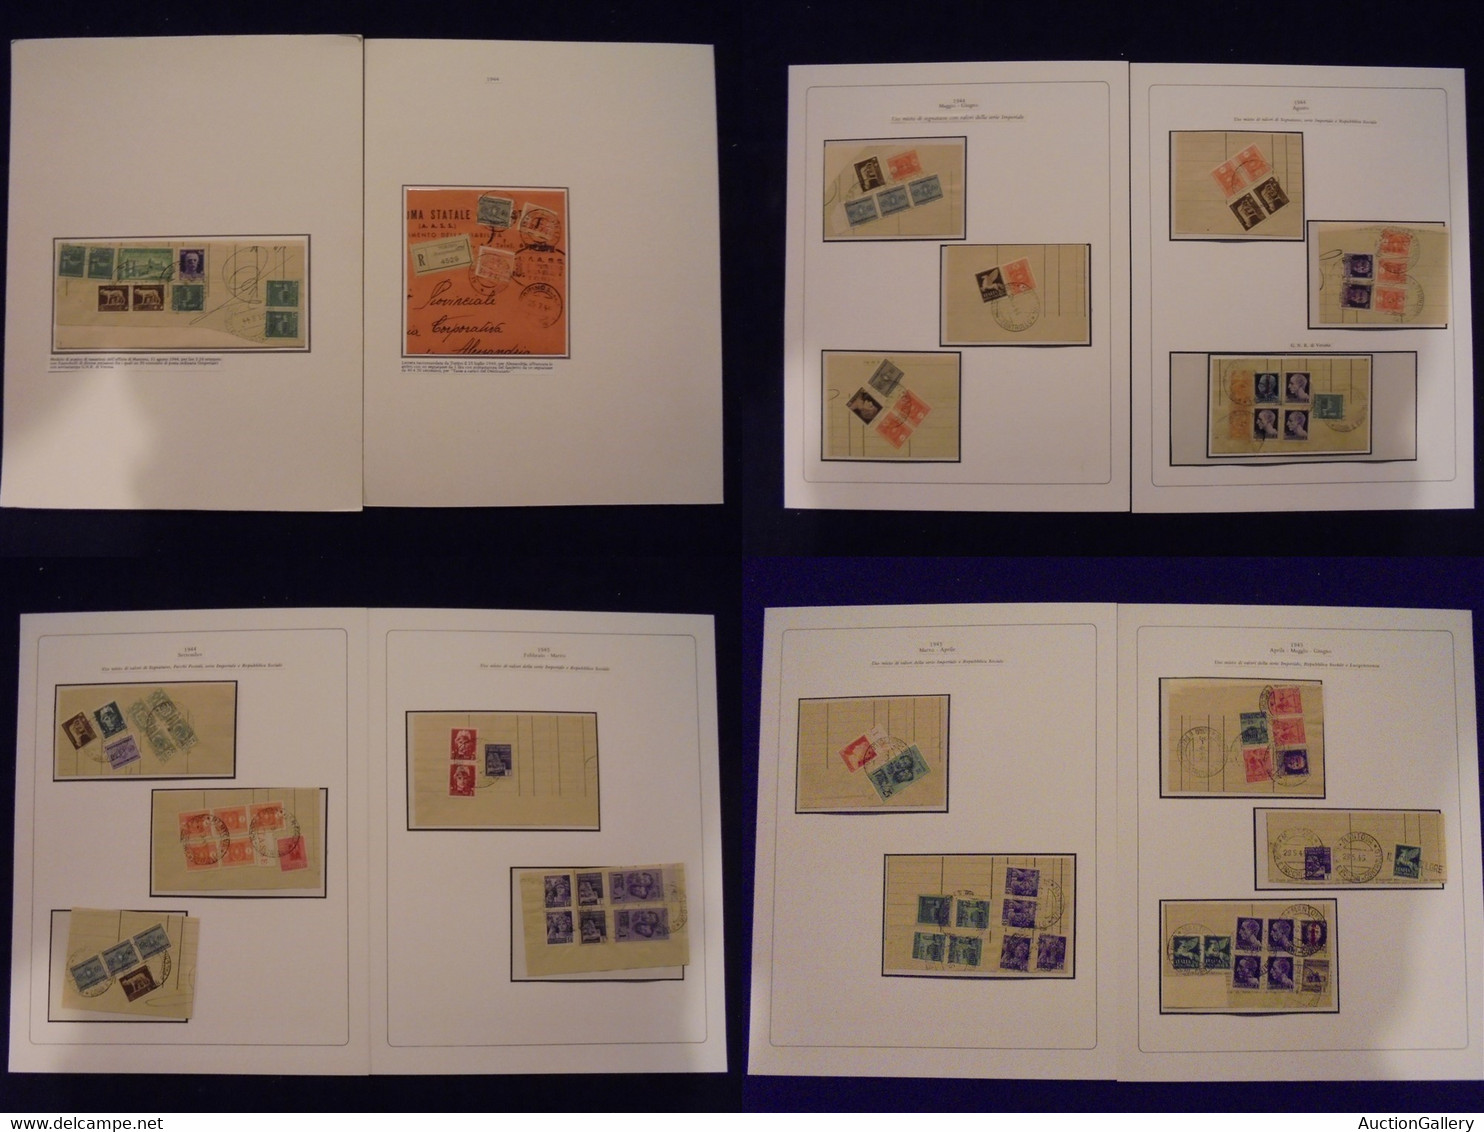 VARIE - 1944/1945 - Mantova - Moduli Di Scarico Di Tassazioni - 43 Frammenti Con Varie Tassazioni Miste Di Ordinari + Pa - Unclassified